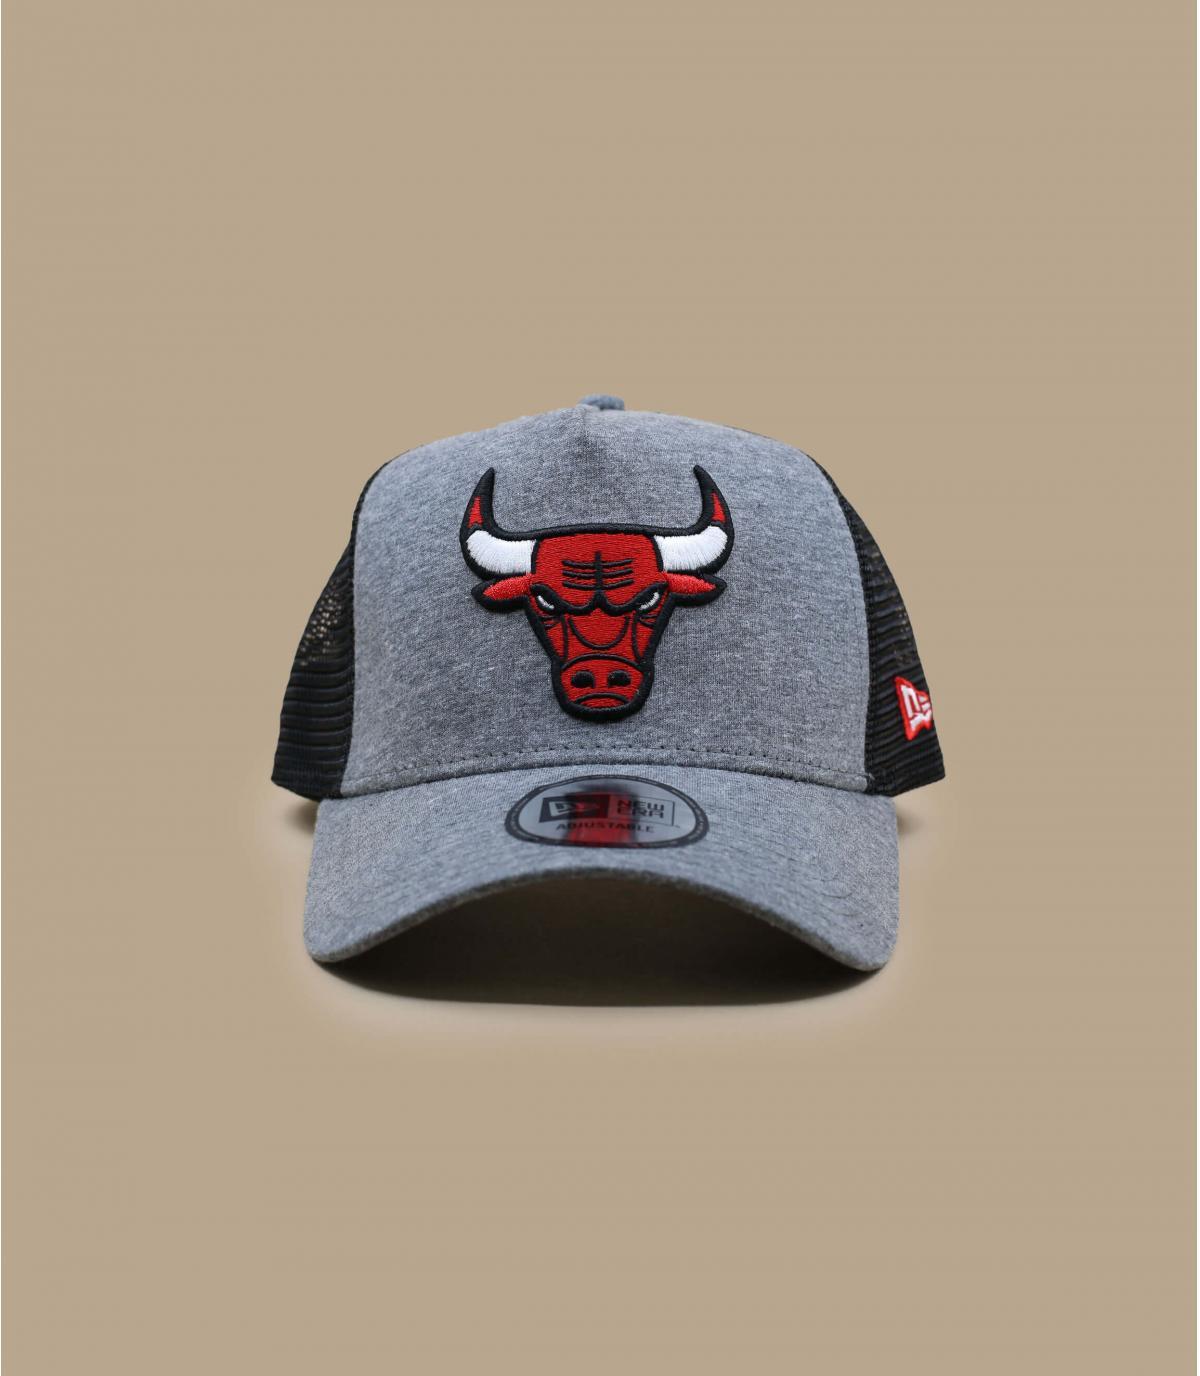 Detalles Trucker Jersey Ess Bulls imagen 2